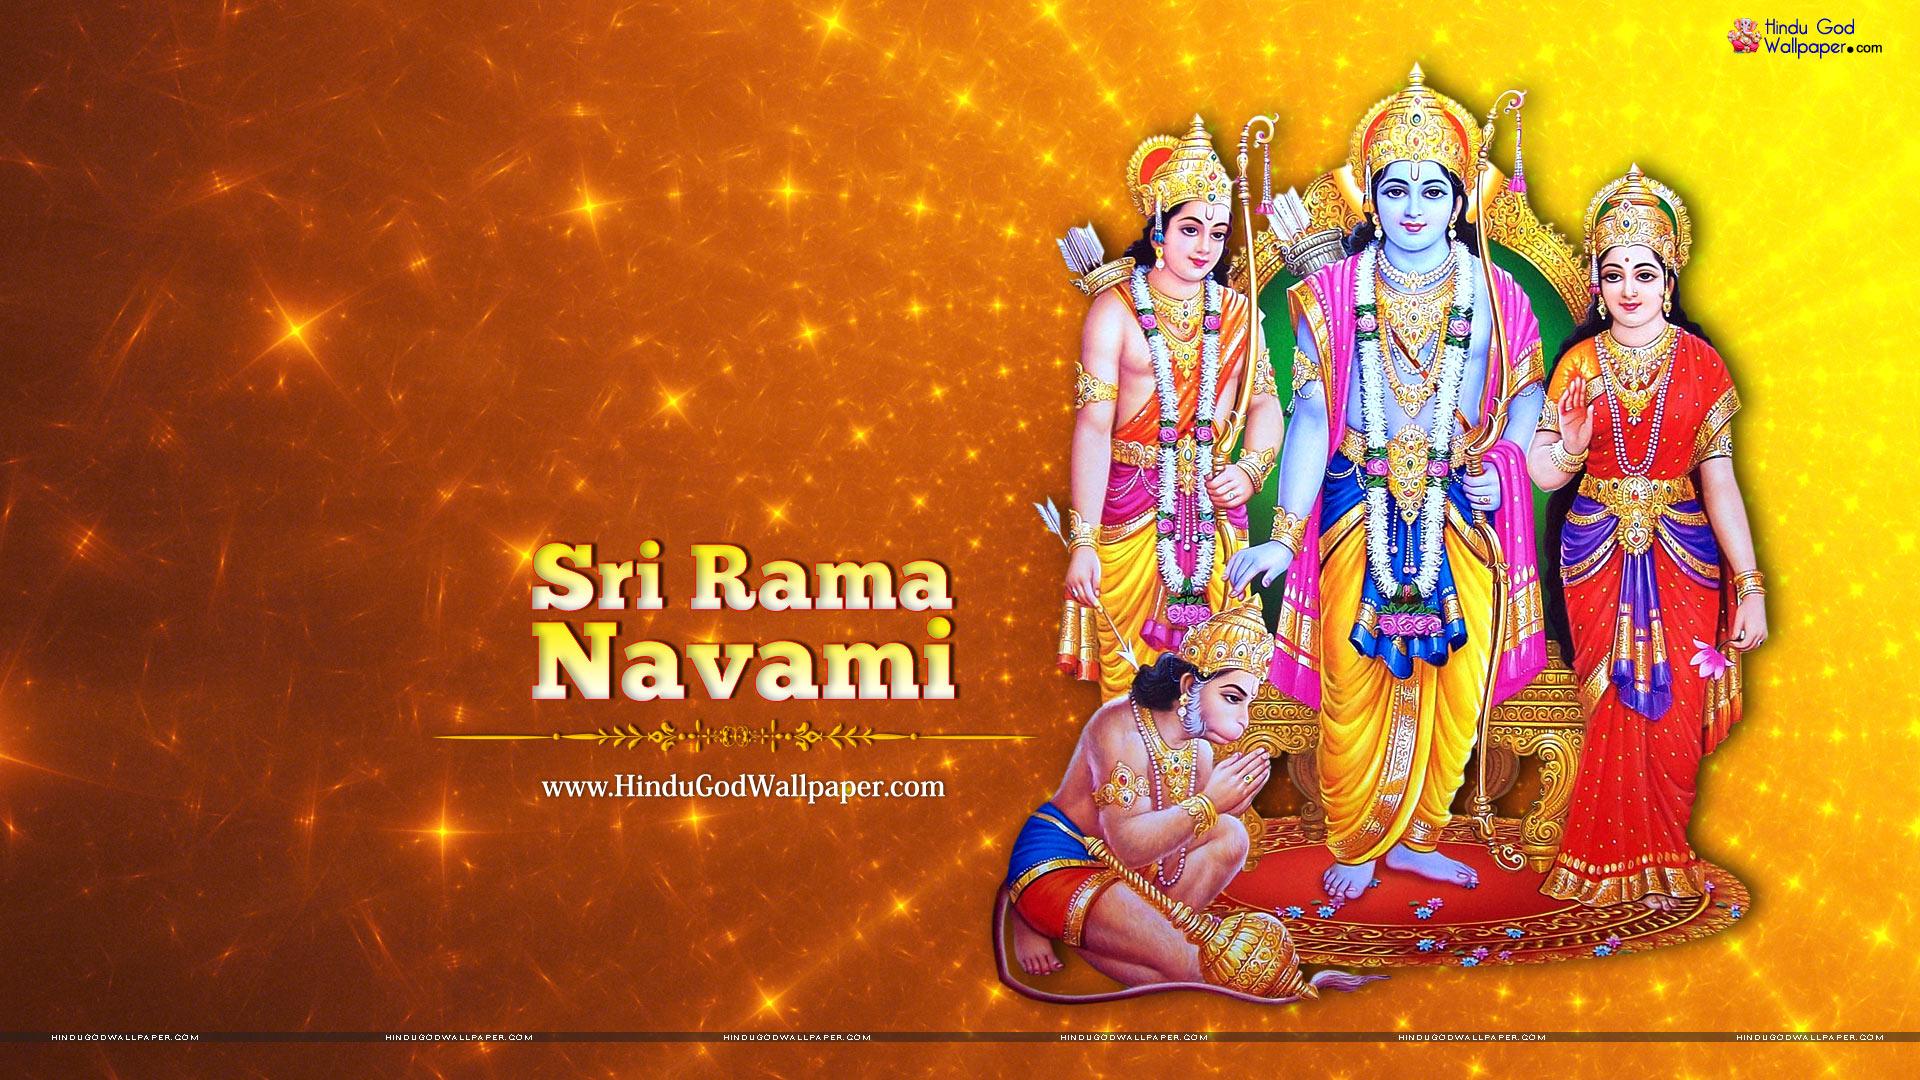 Rama Navami Images Wallpapers Greetings Cards 2018